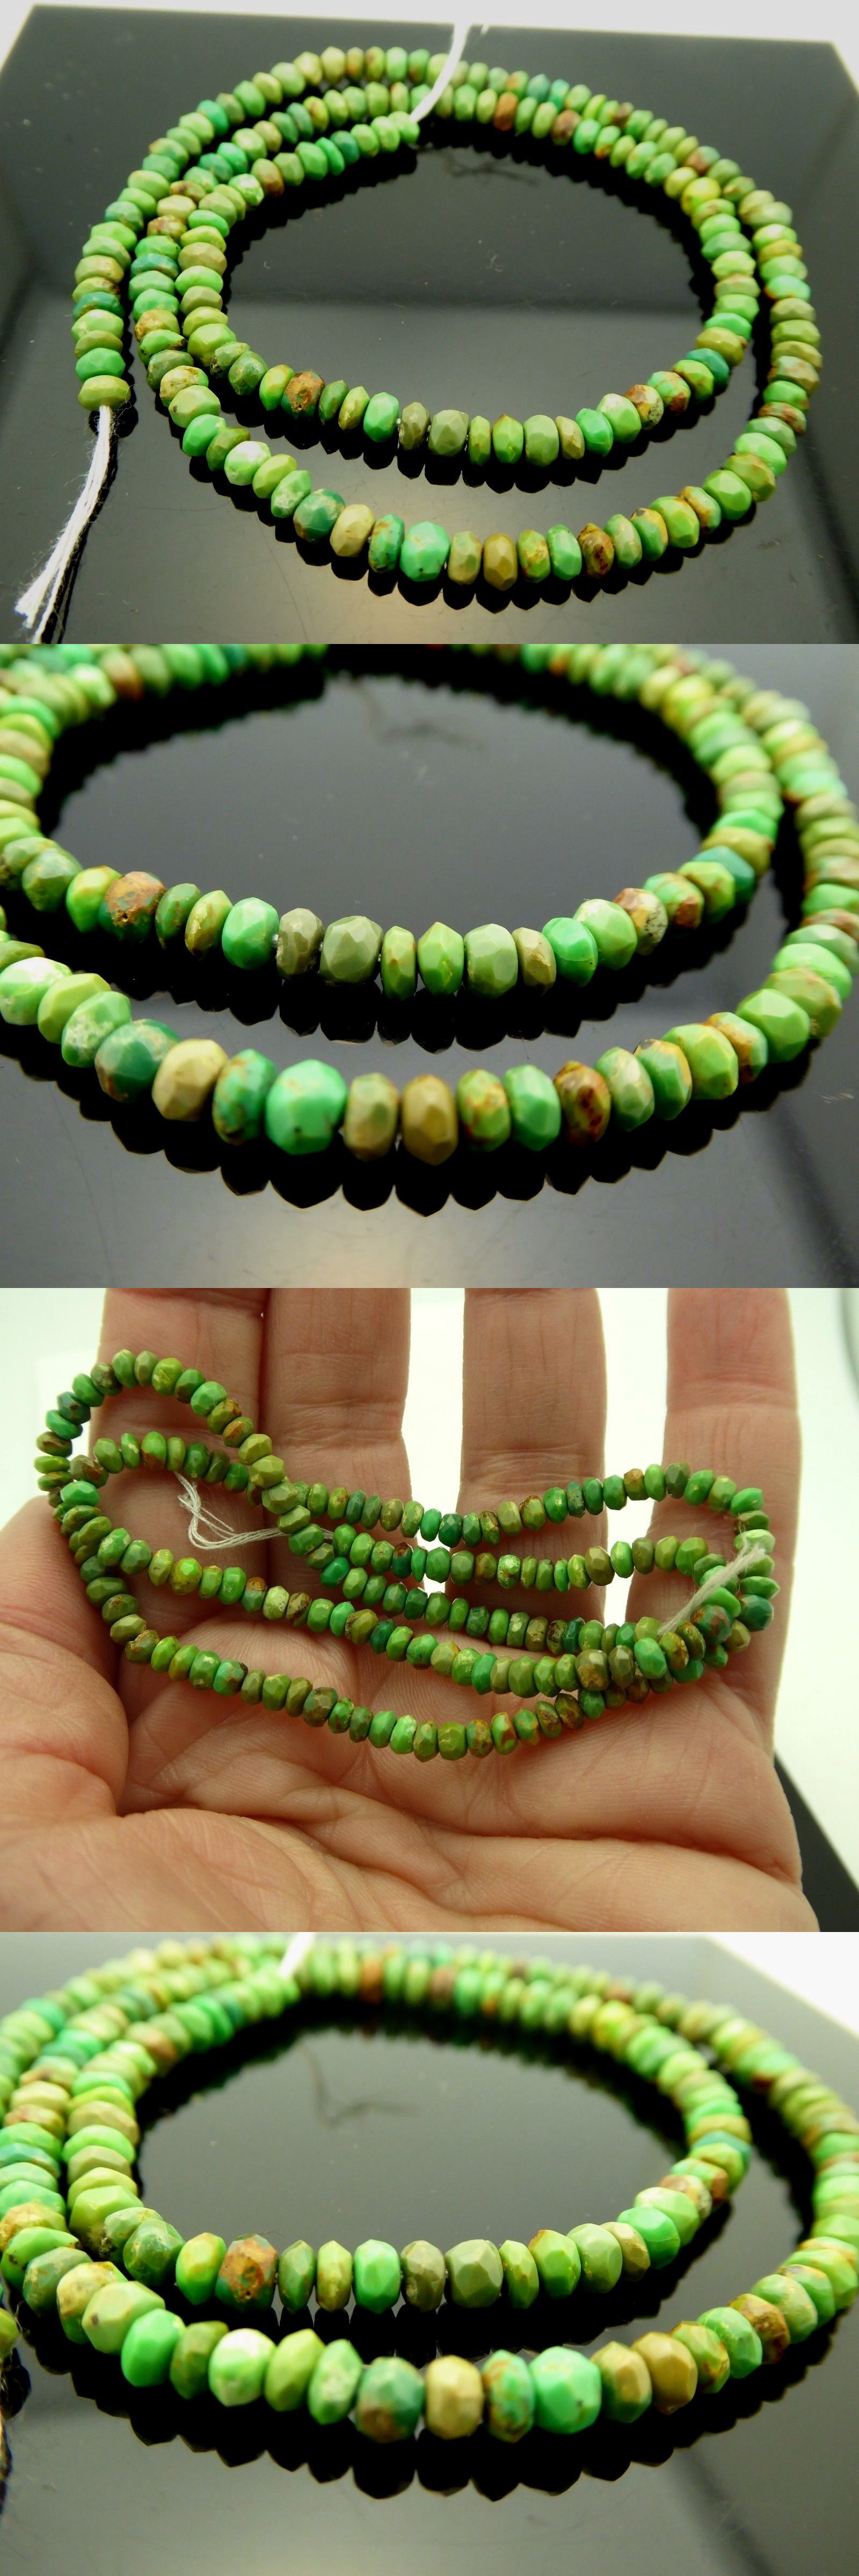 Gaspeite Beads